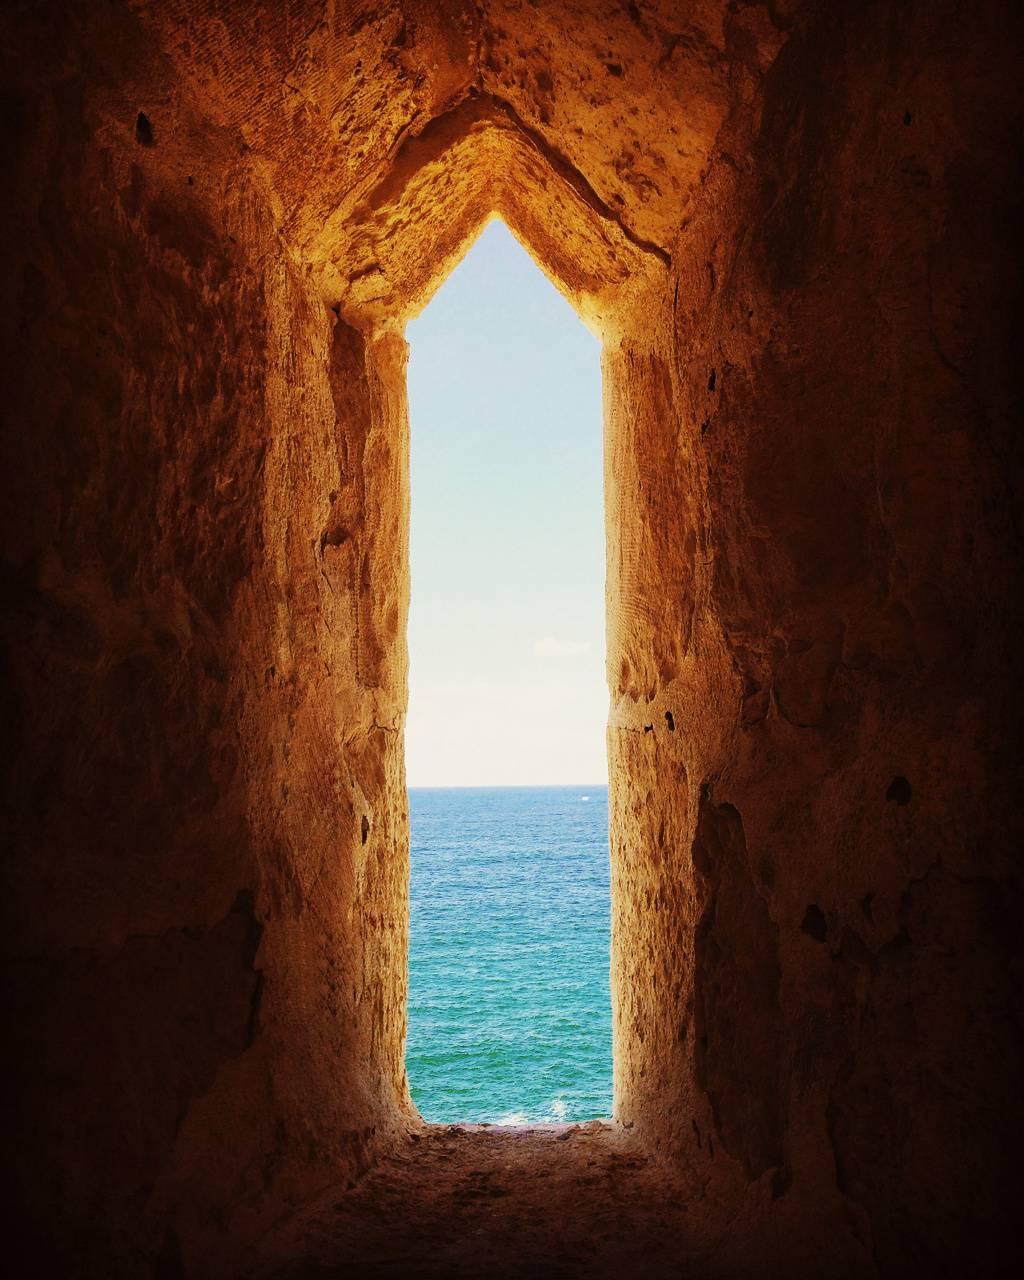 Qaitbay window